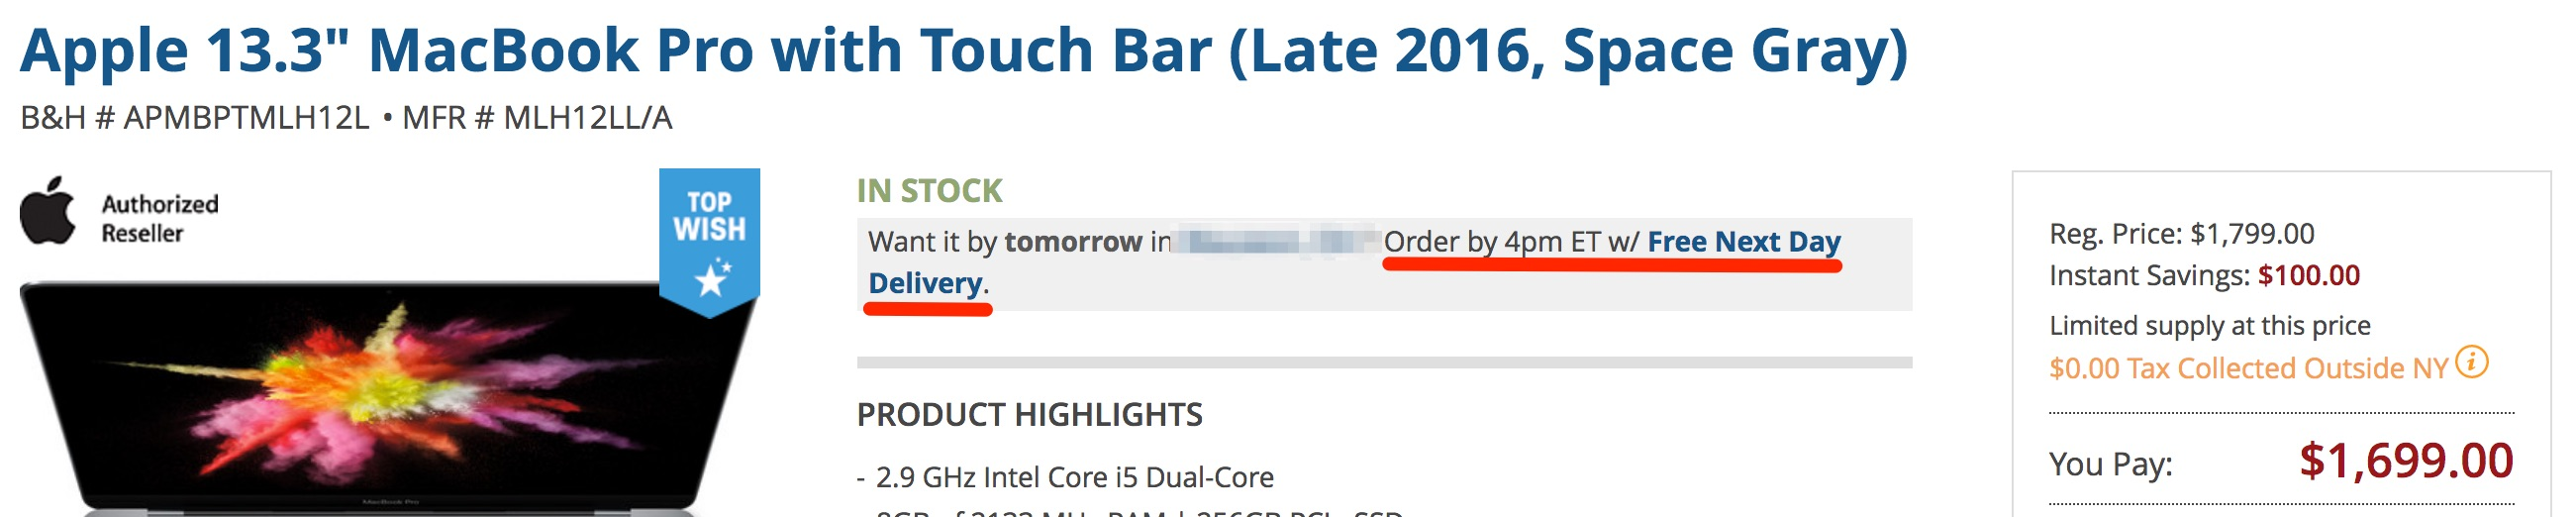 apple-13-inch-macbook-pro-bh-deal